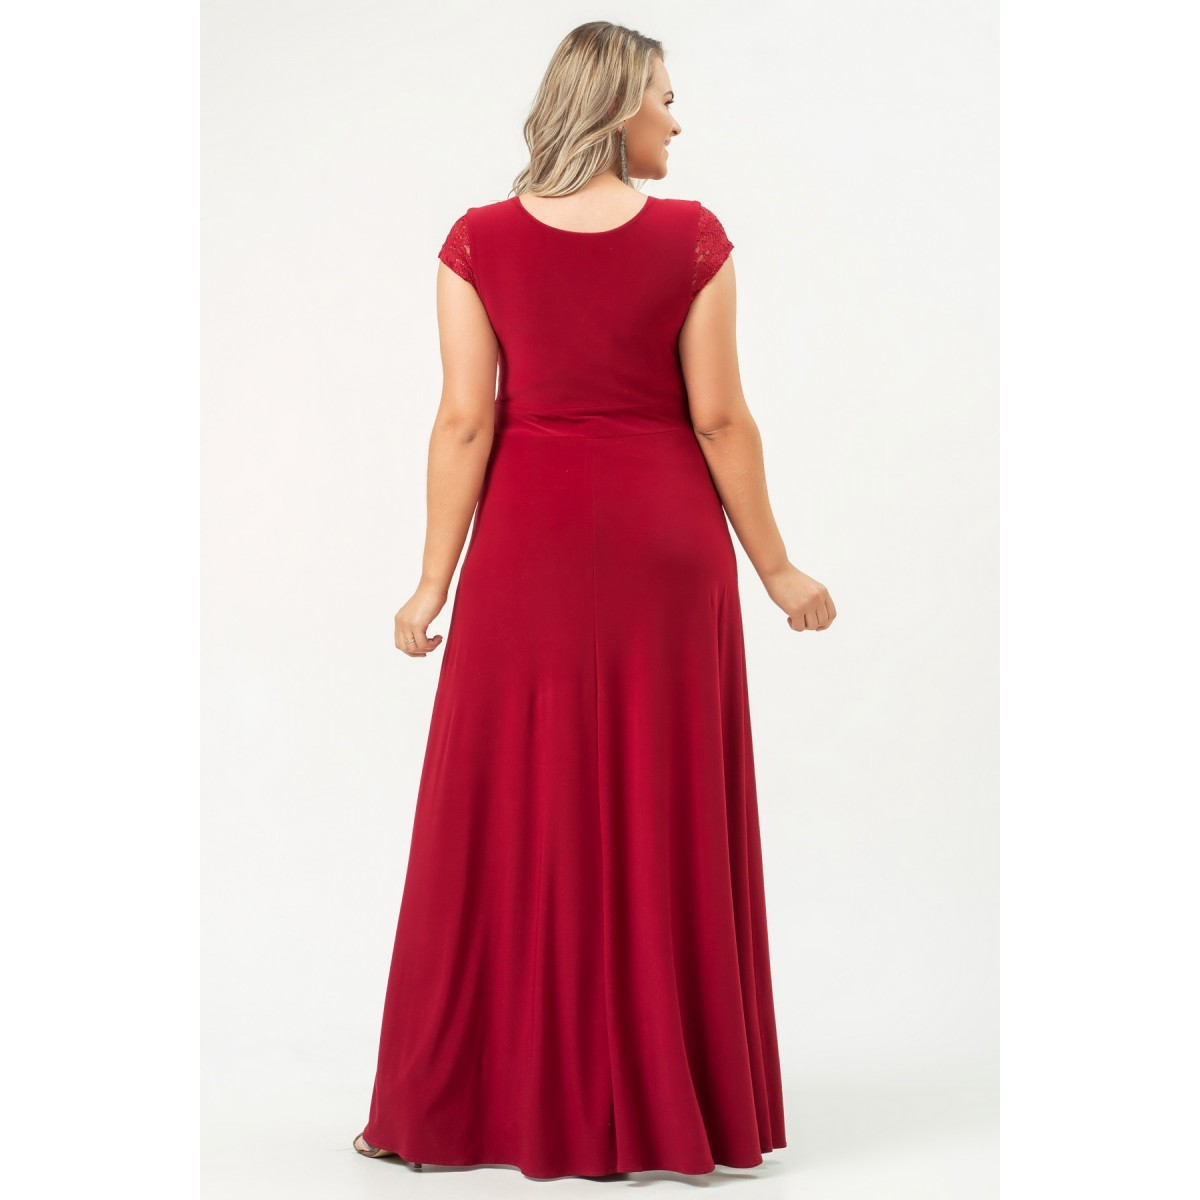 Vestido Lana - VINHO